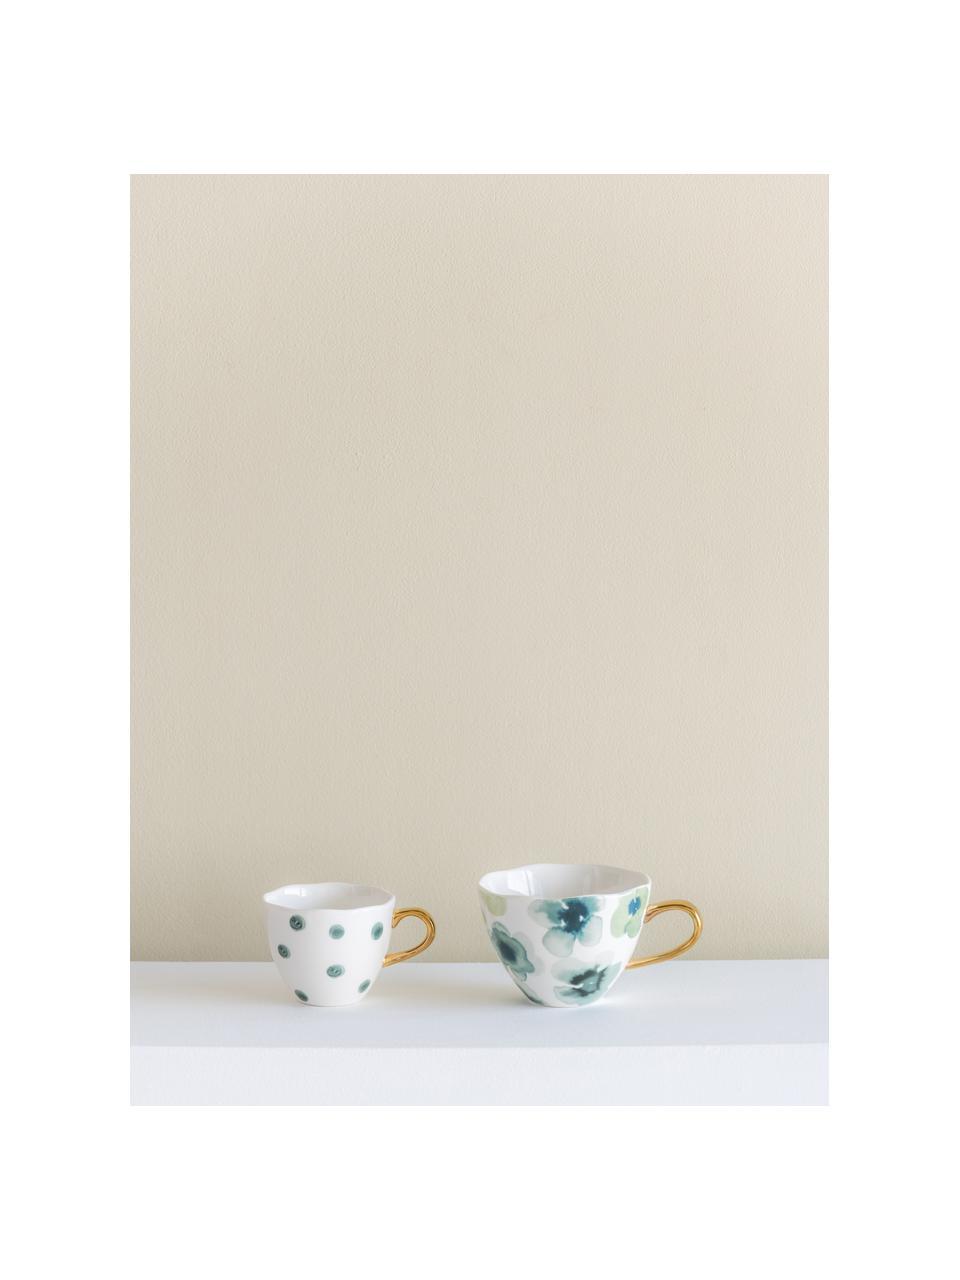 Bemalte Tasse Good Morning mit goldenem Griff, New Bone China, Weiß, Grün, Blau, Goldfarben, Ø 11 x H 8 cm